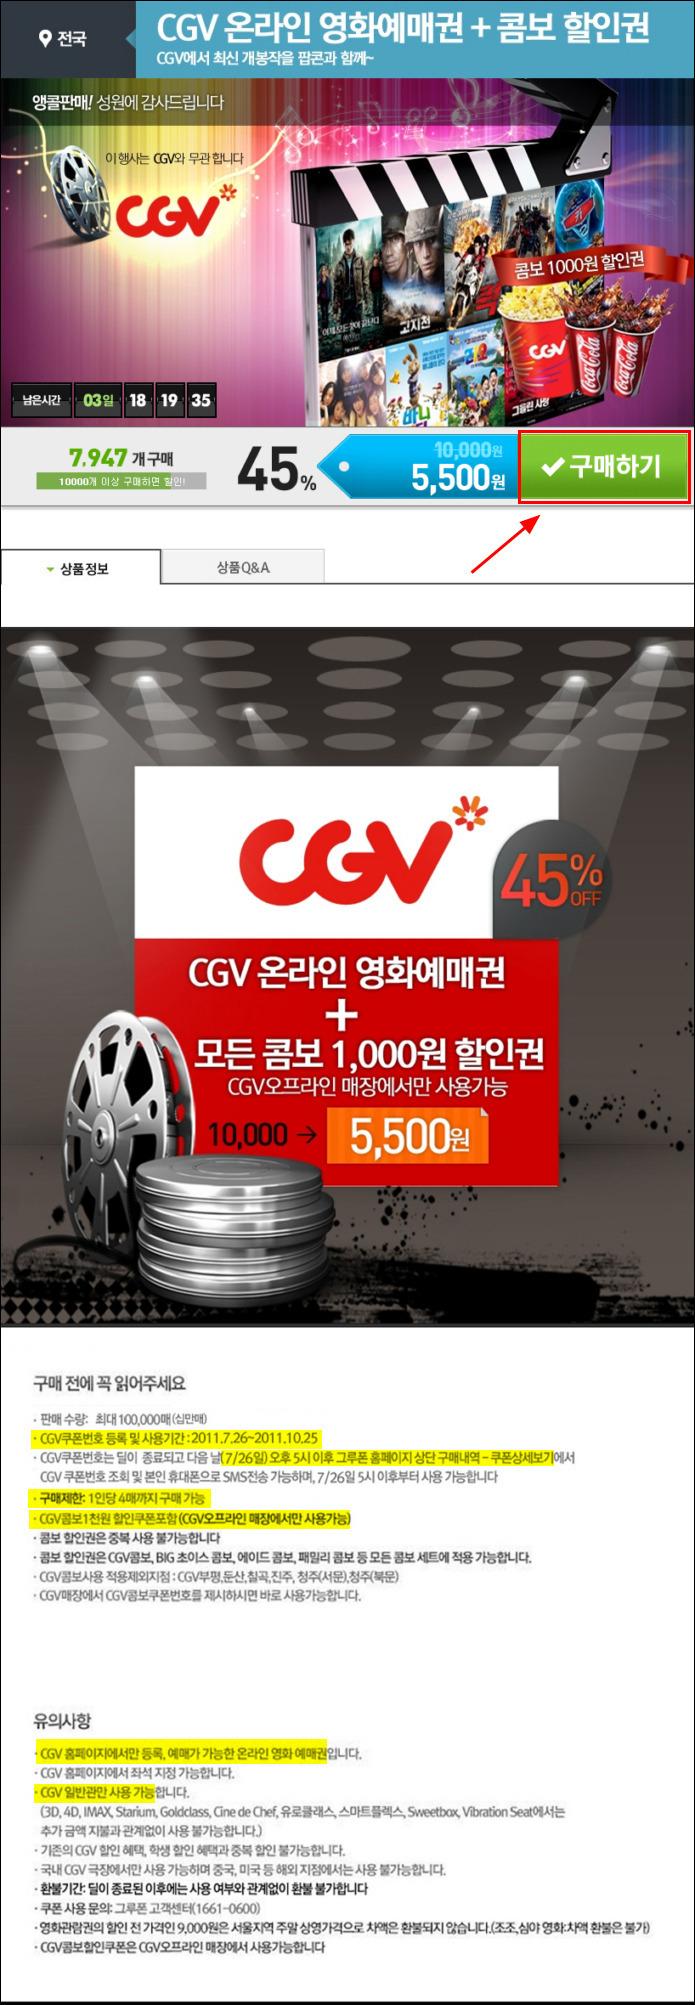 cgv 영화예매권 5,500원